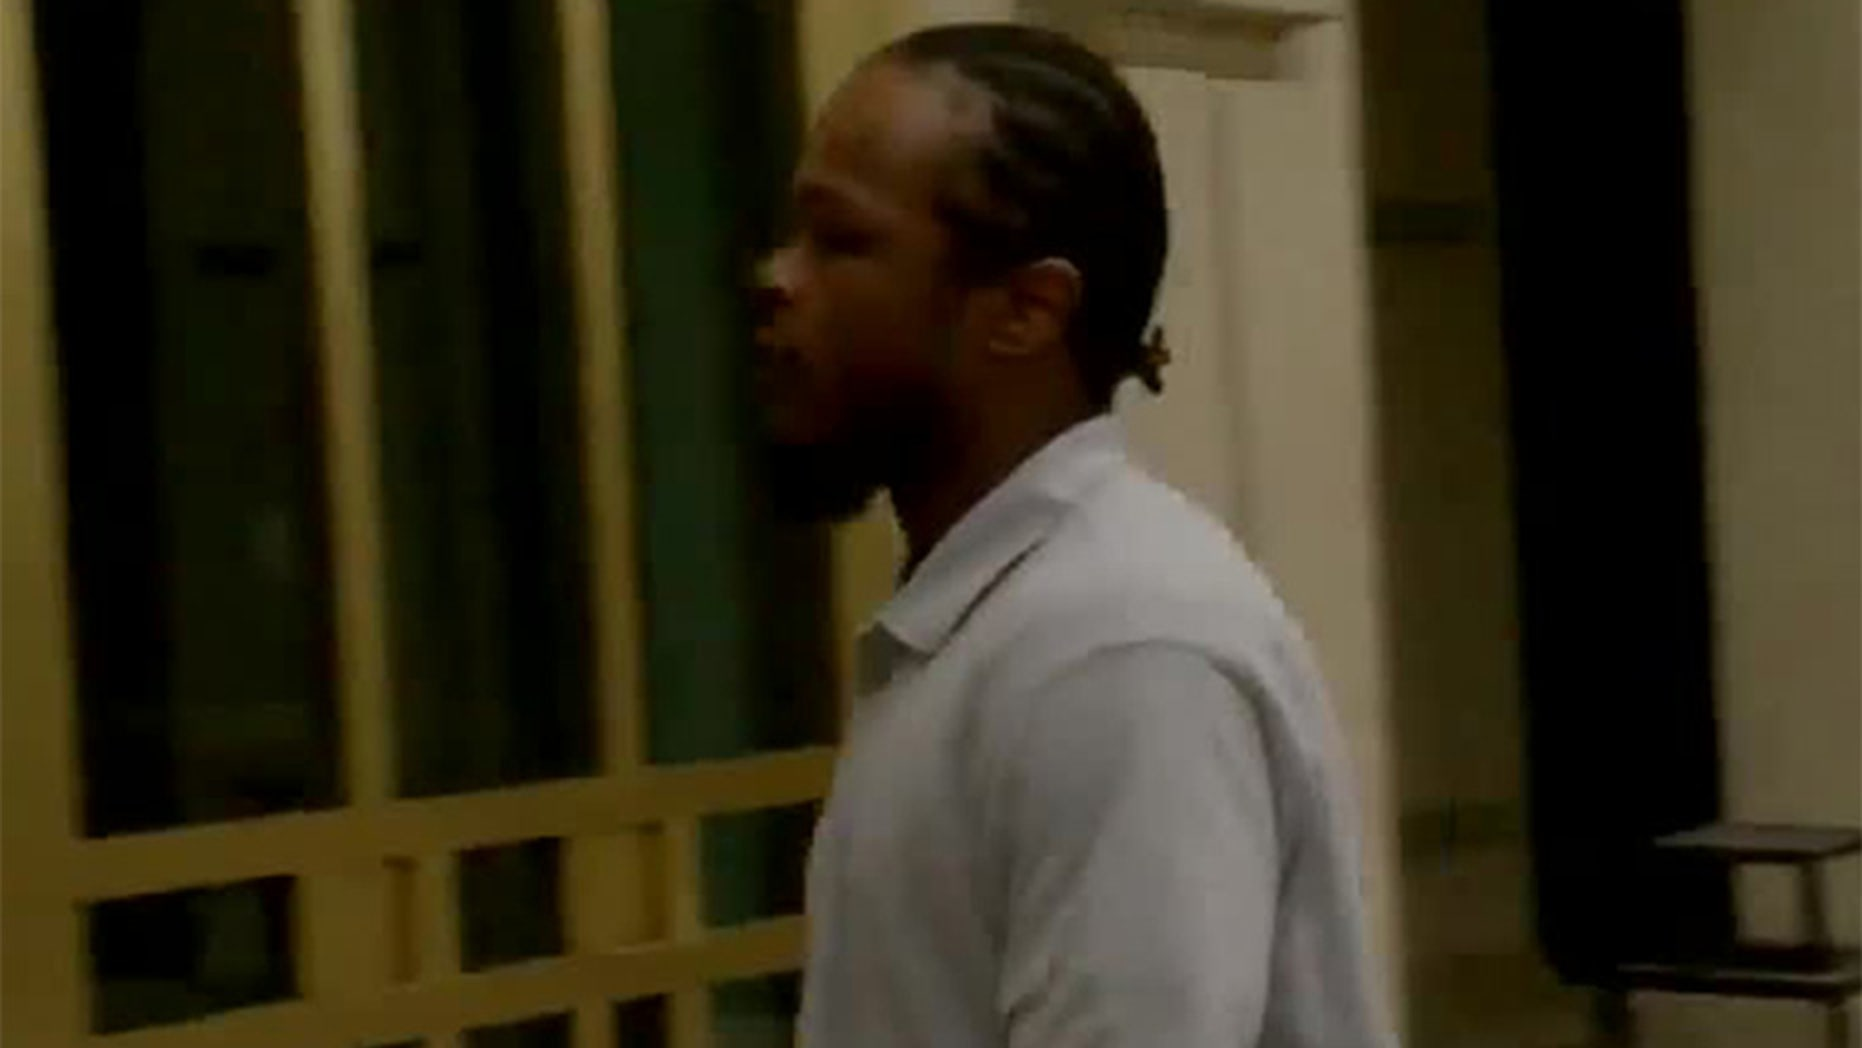 Jordan Hancock during a court appearance Monday.